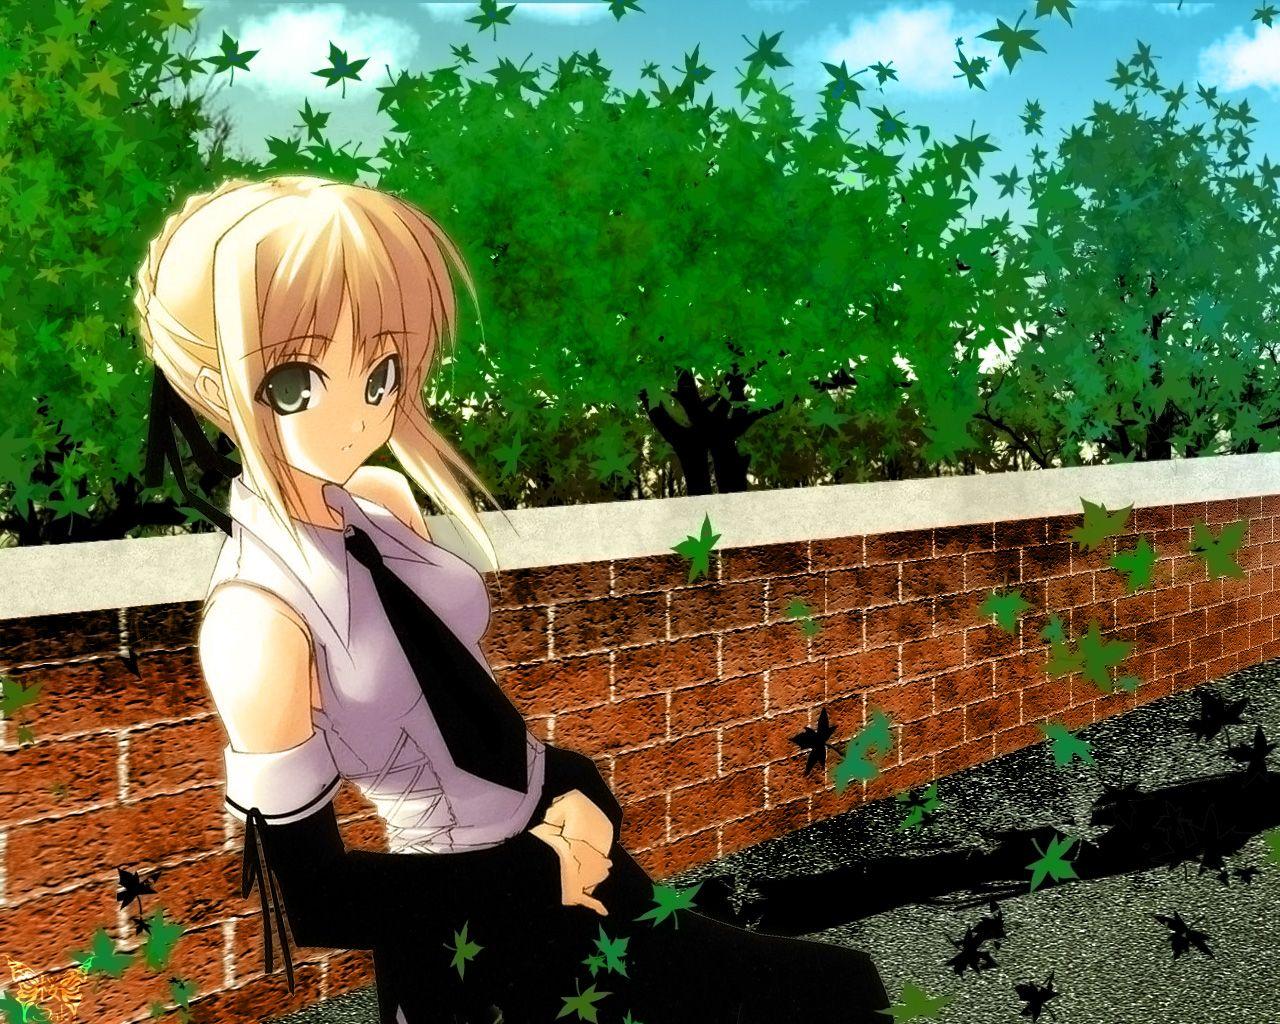 Minitokyo_Fate-Stay_Night_Wallpapers_211235.jpg